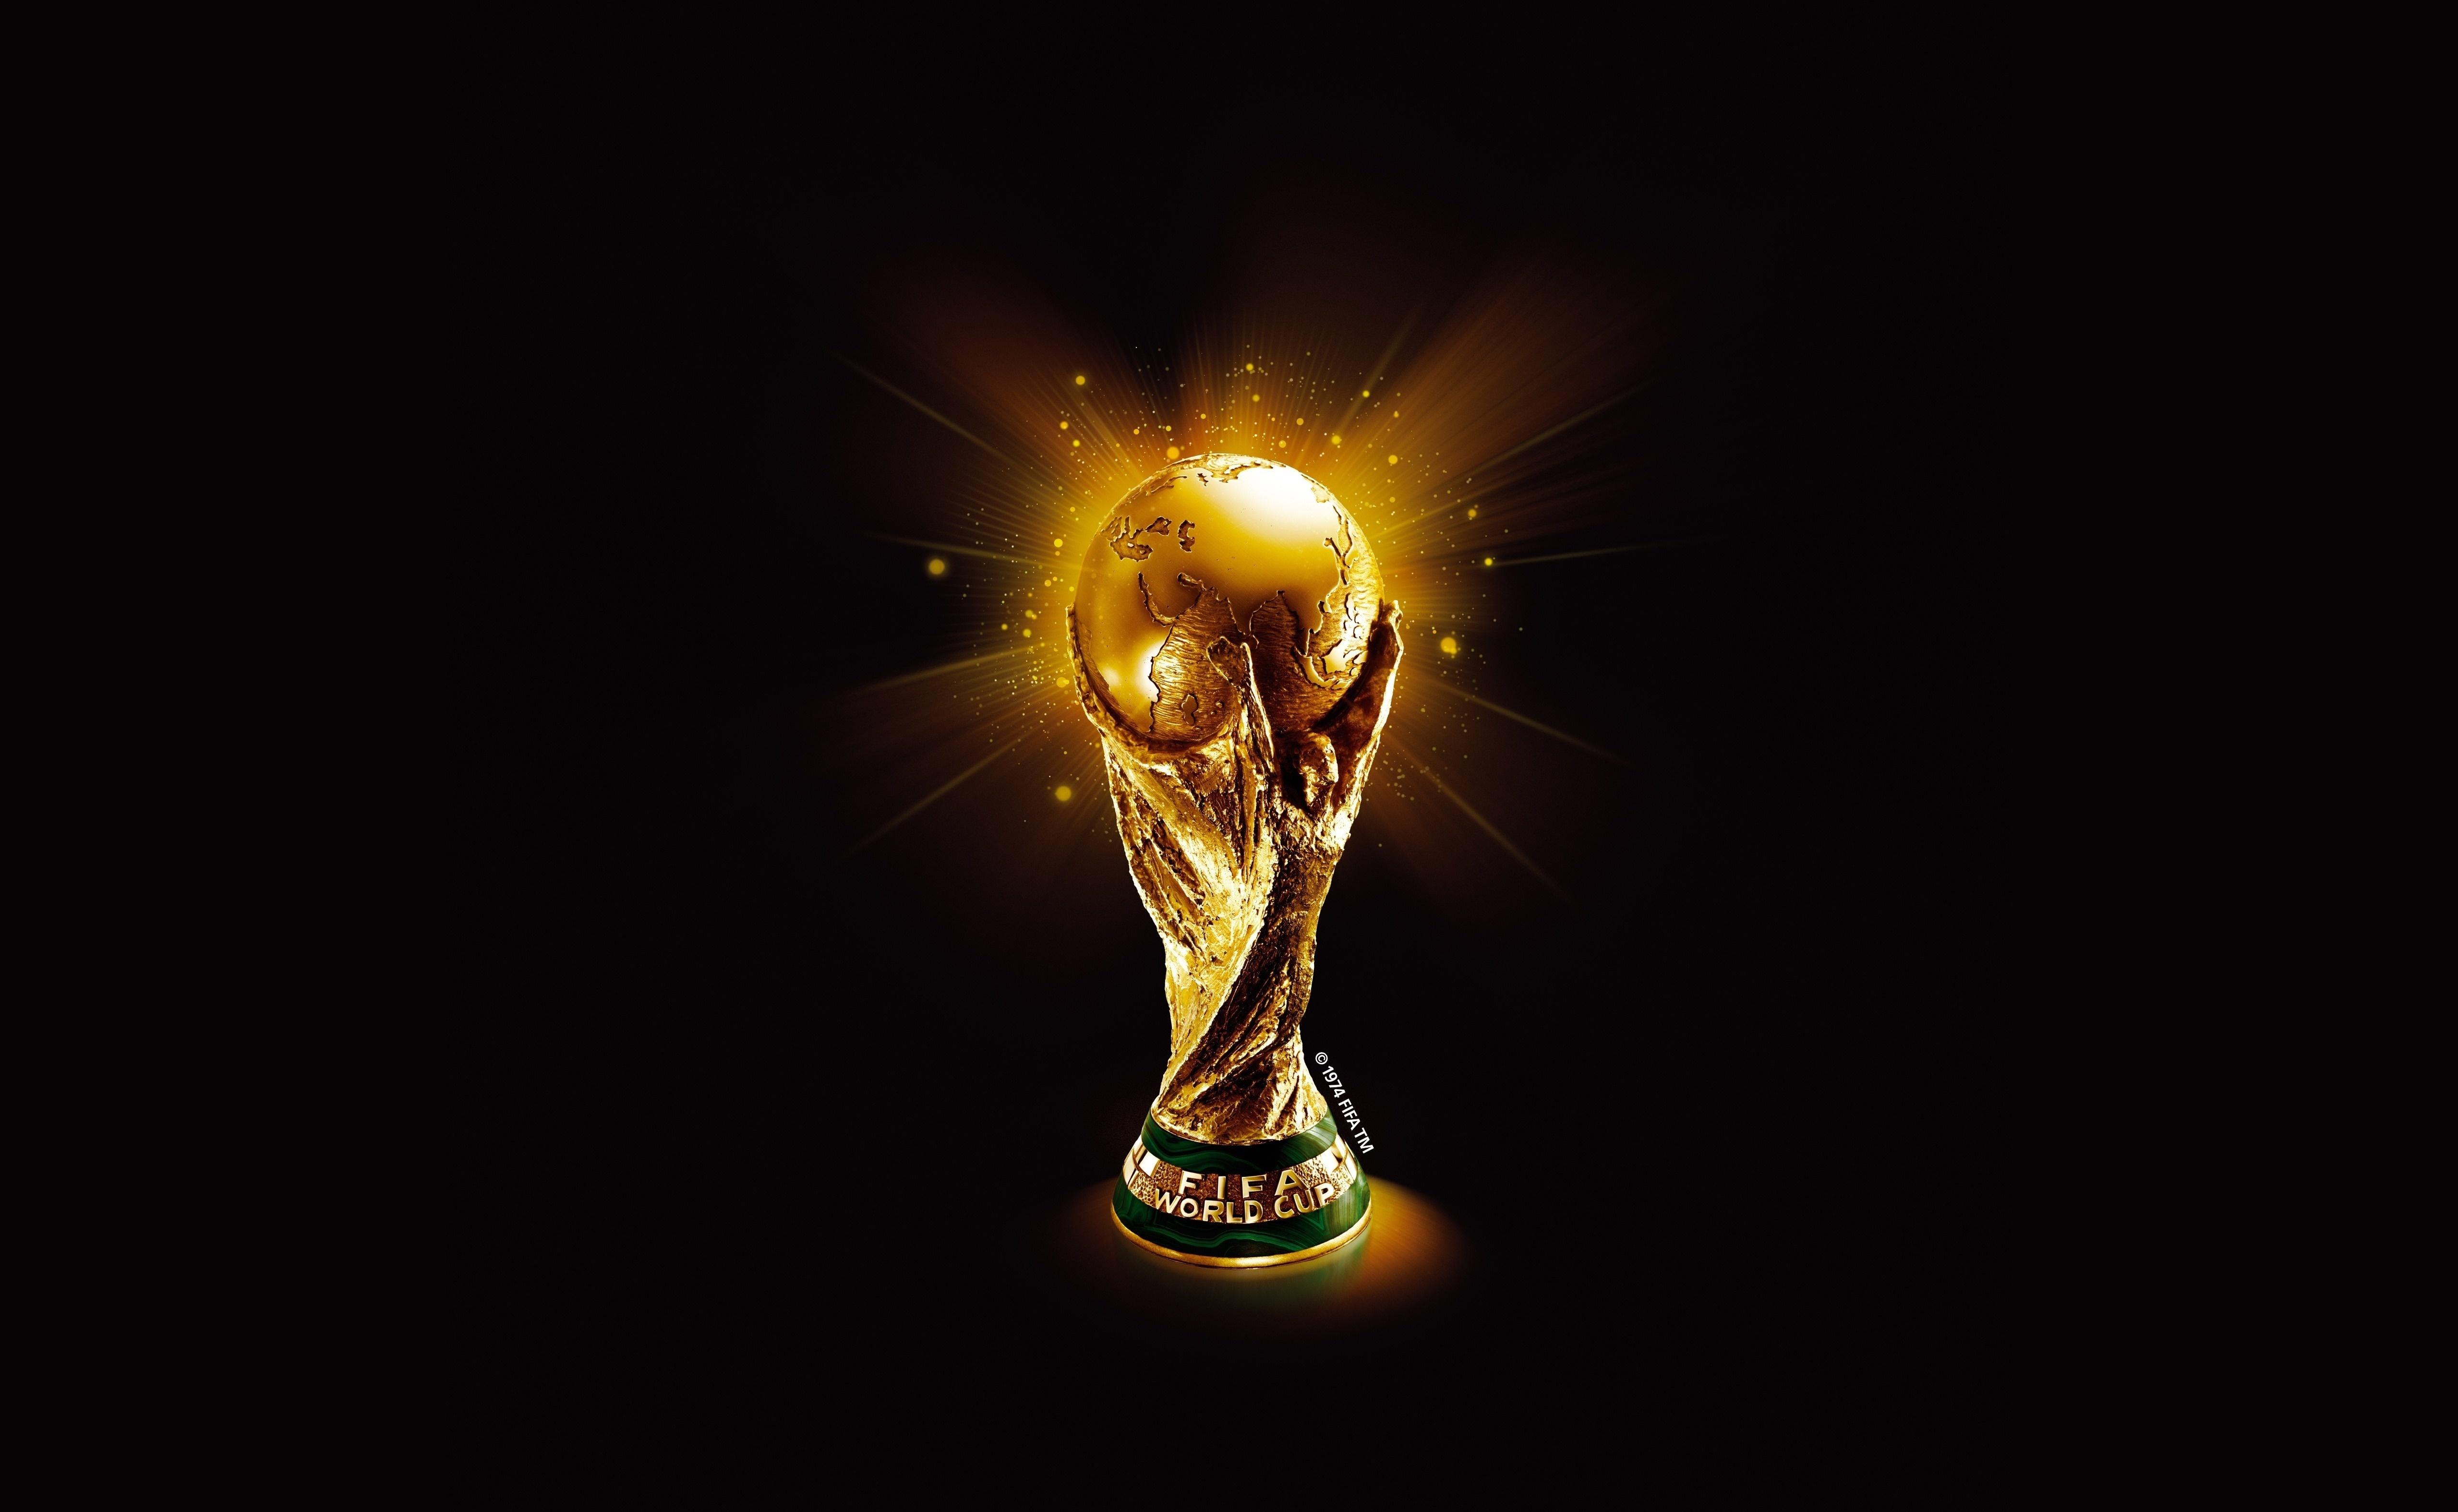 чемпионат мира u 20